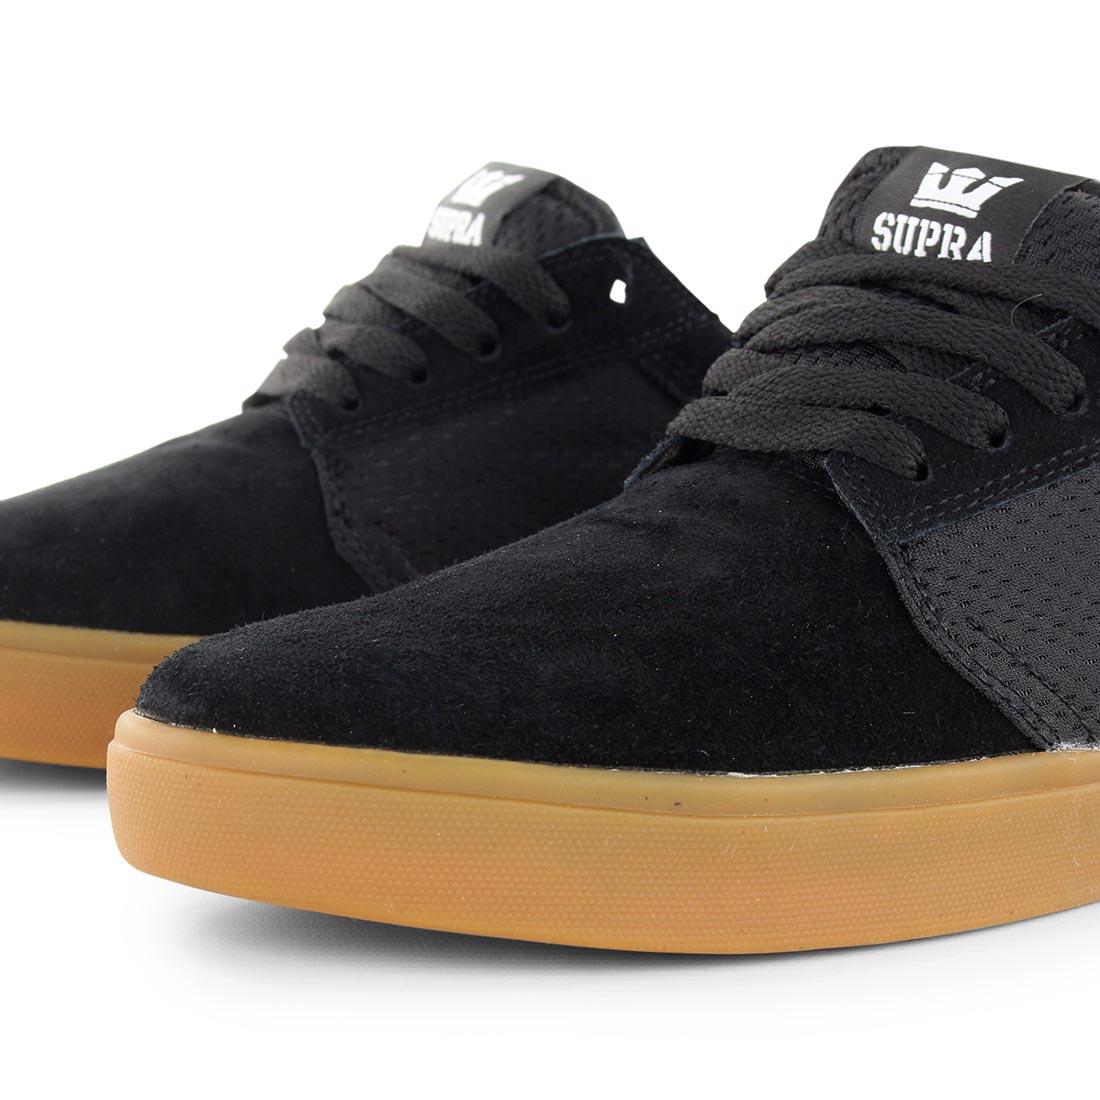 innovative design 9222d d8720 Supra-Shoes-Hammer-Black-Gum-05